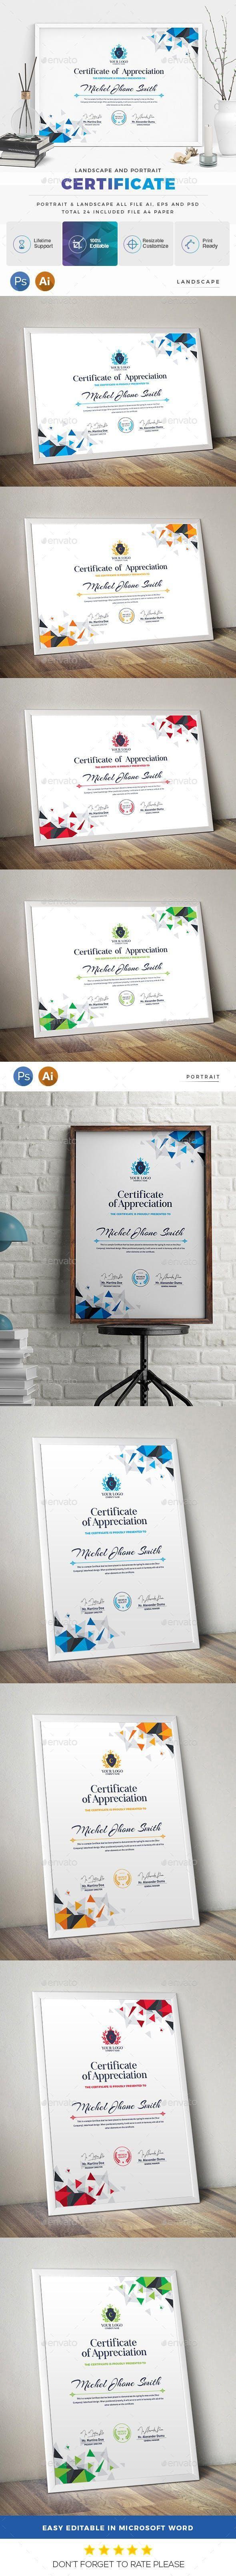 Certificate #CertificateDesign #GraphicResource #PrintDesign #Envato #Stationery...